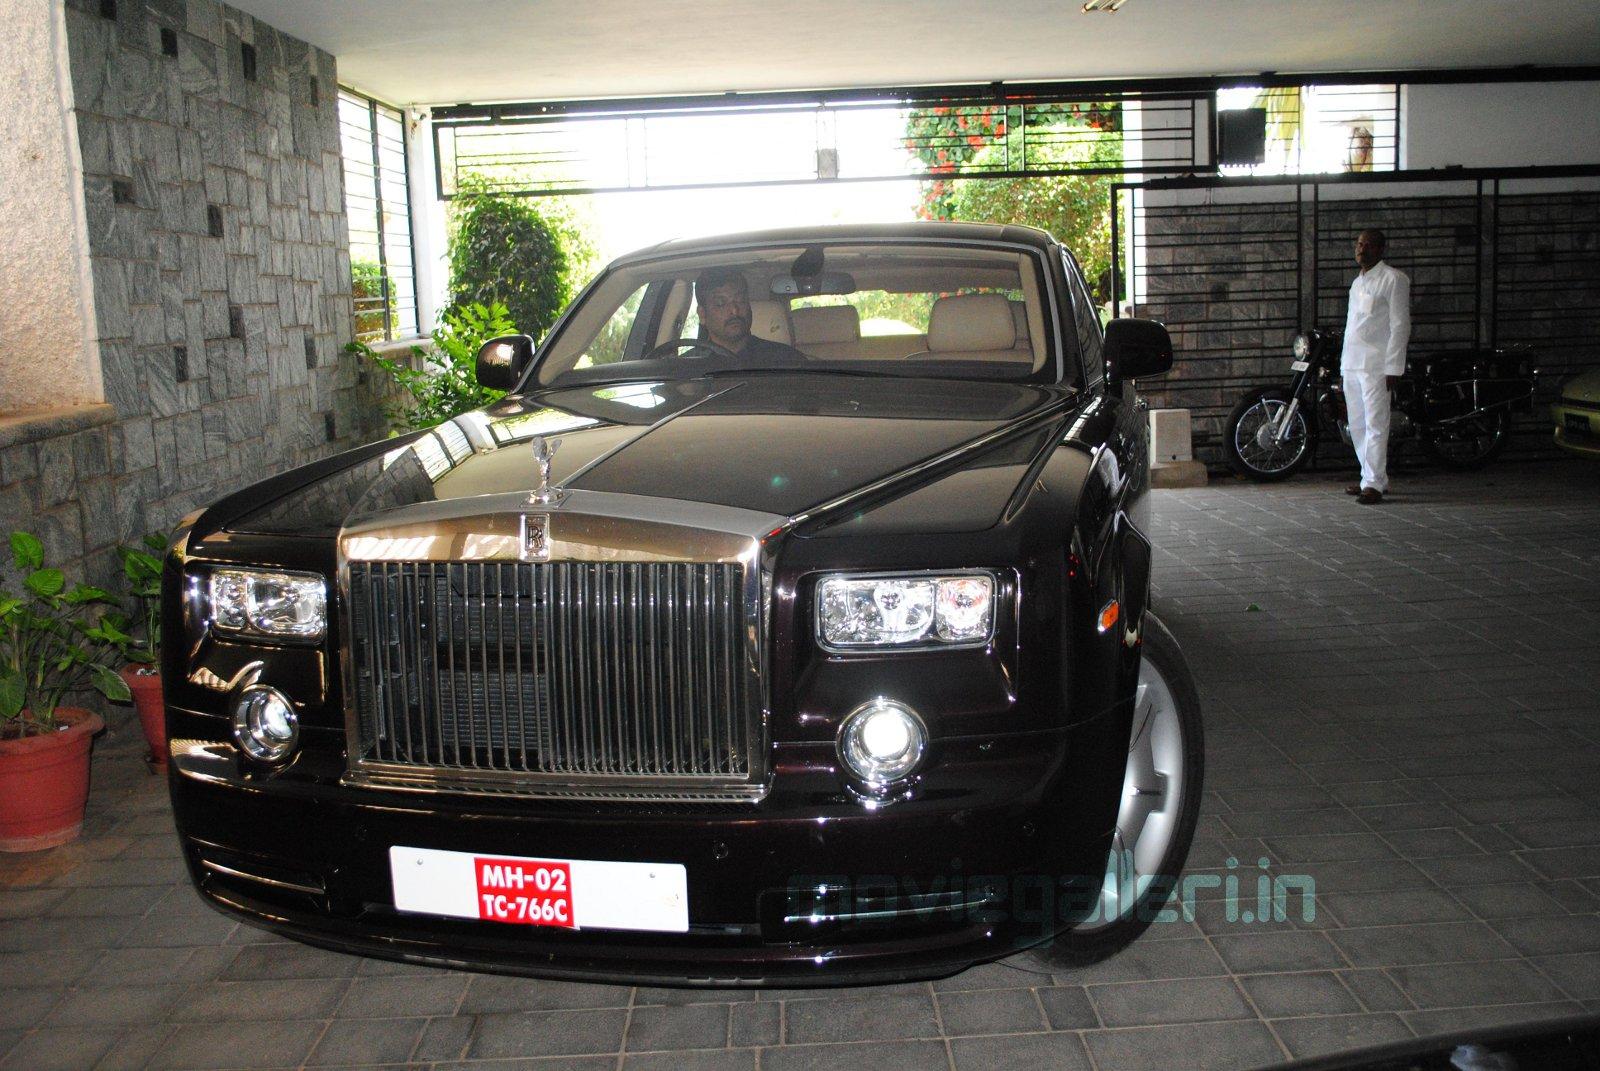 Chiranjeevi New Rolls Royce Car Pics Rolls Royce Pantom